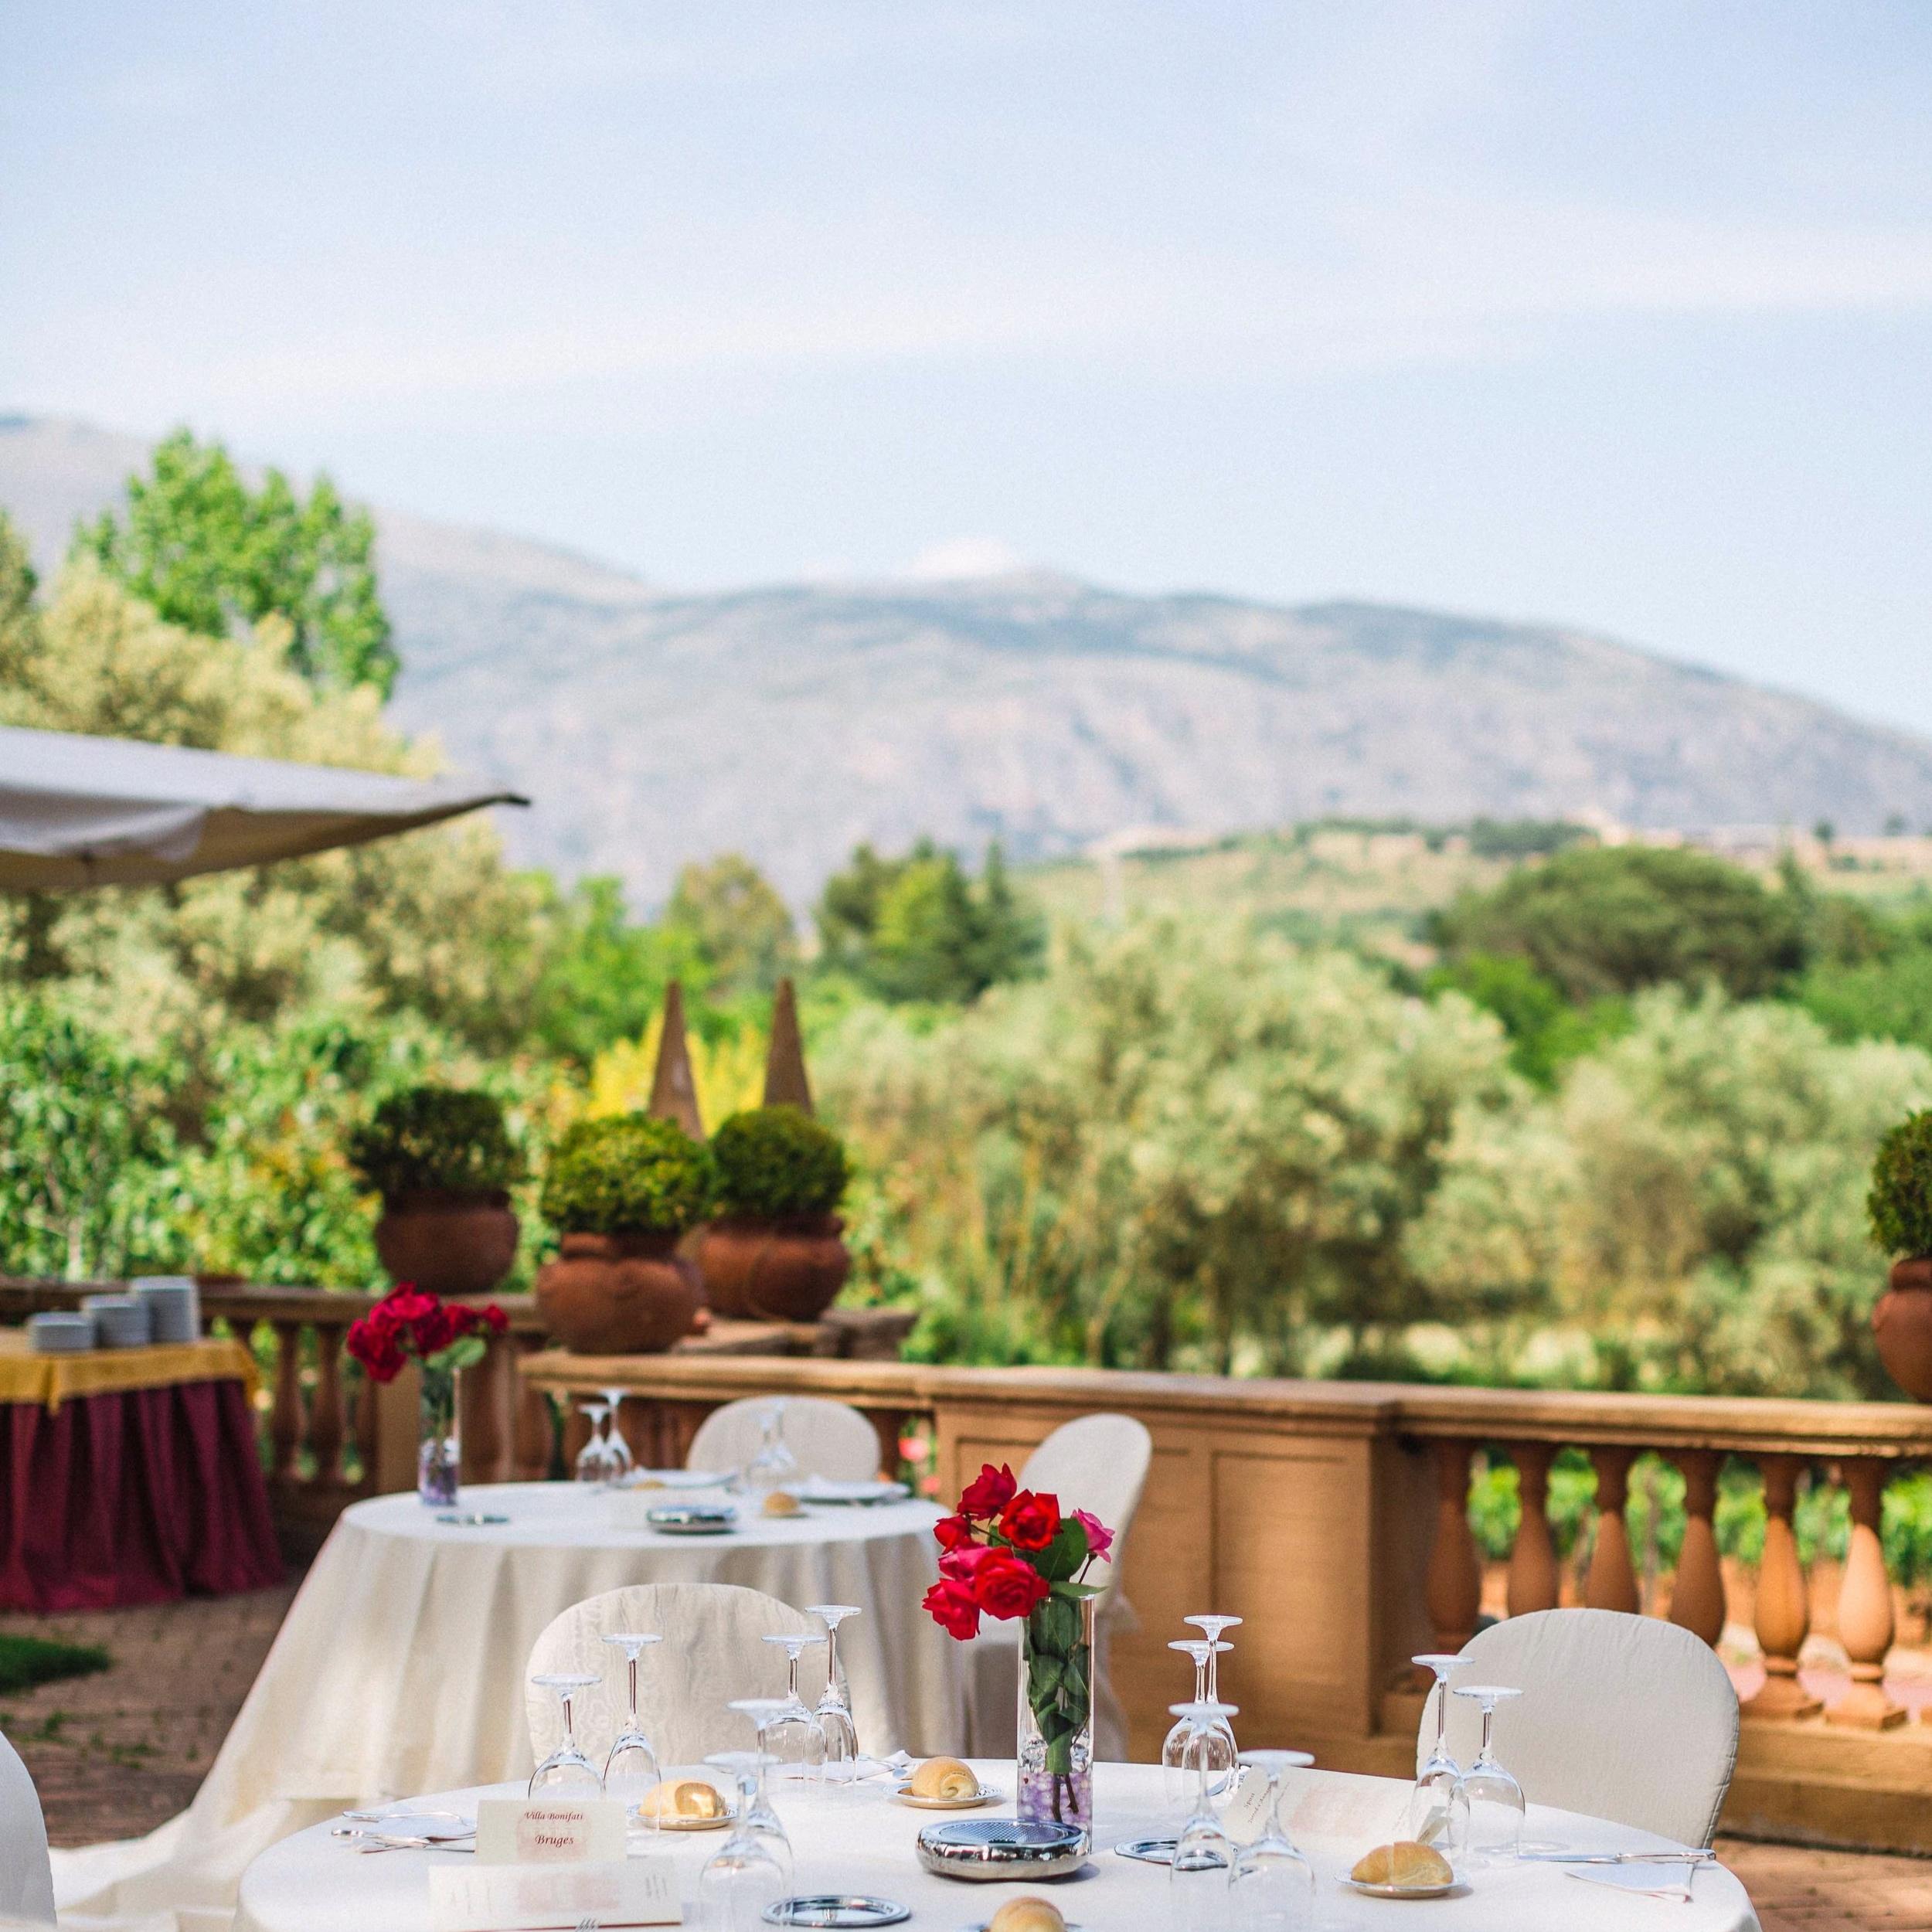 rome-wedding-planner-italy-wedding-planner-all-inclusive-italy-wedding-destination-wedding-2.jpg